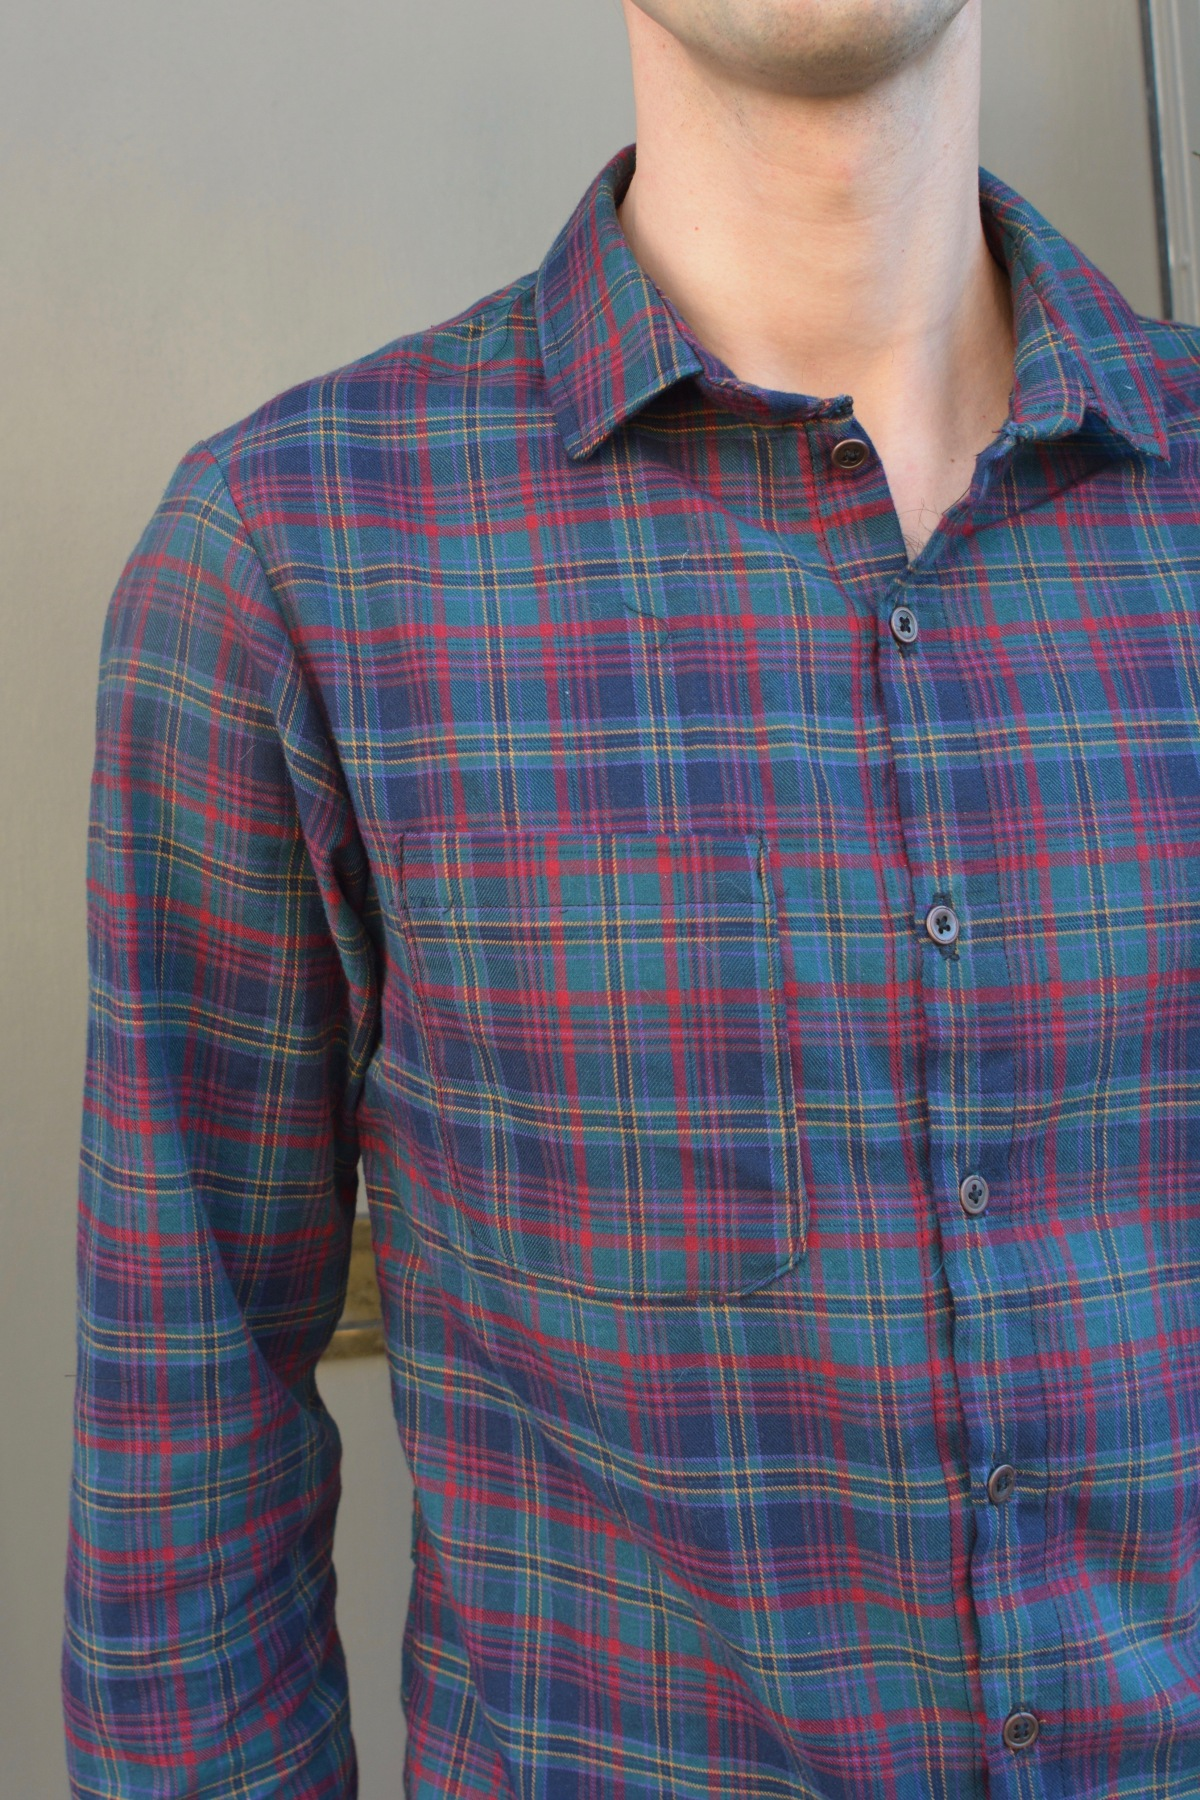 mens shirt_02